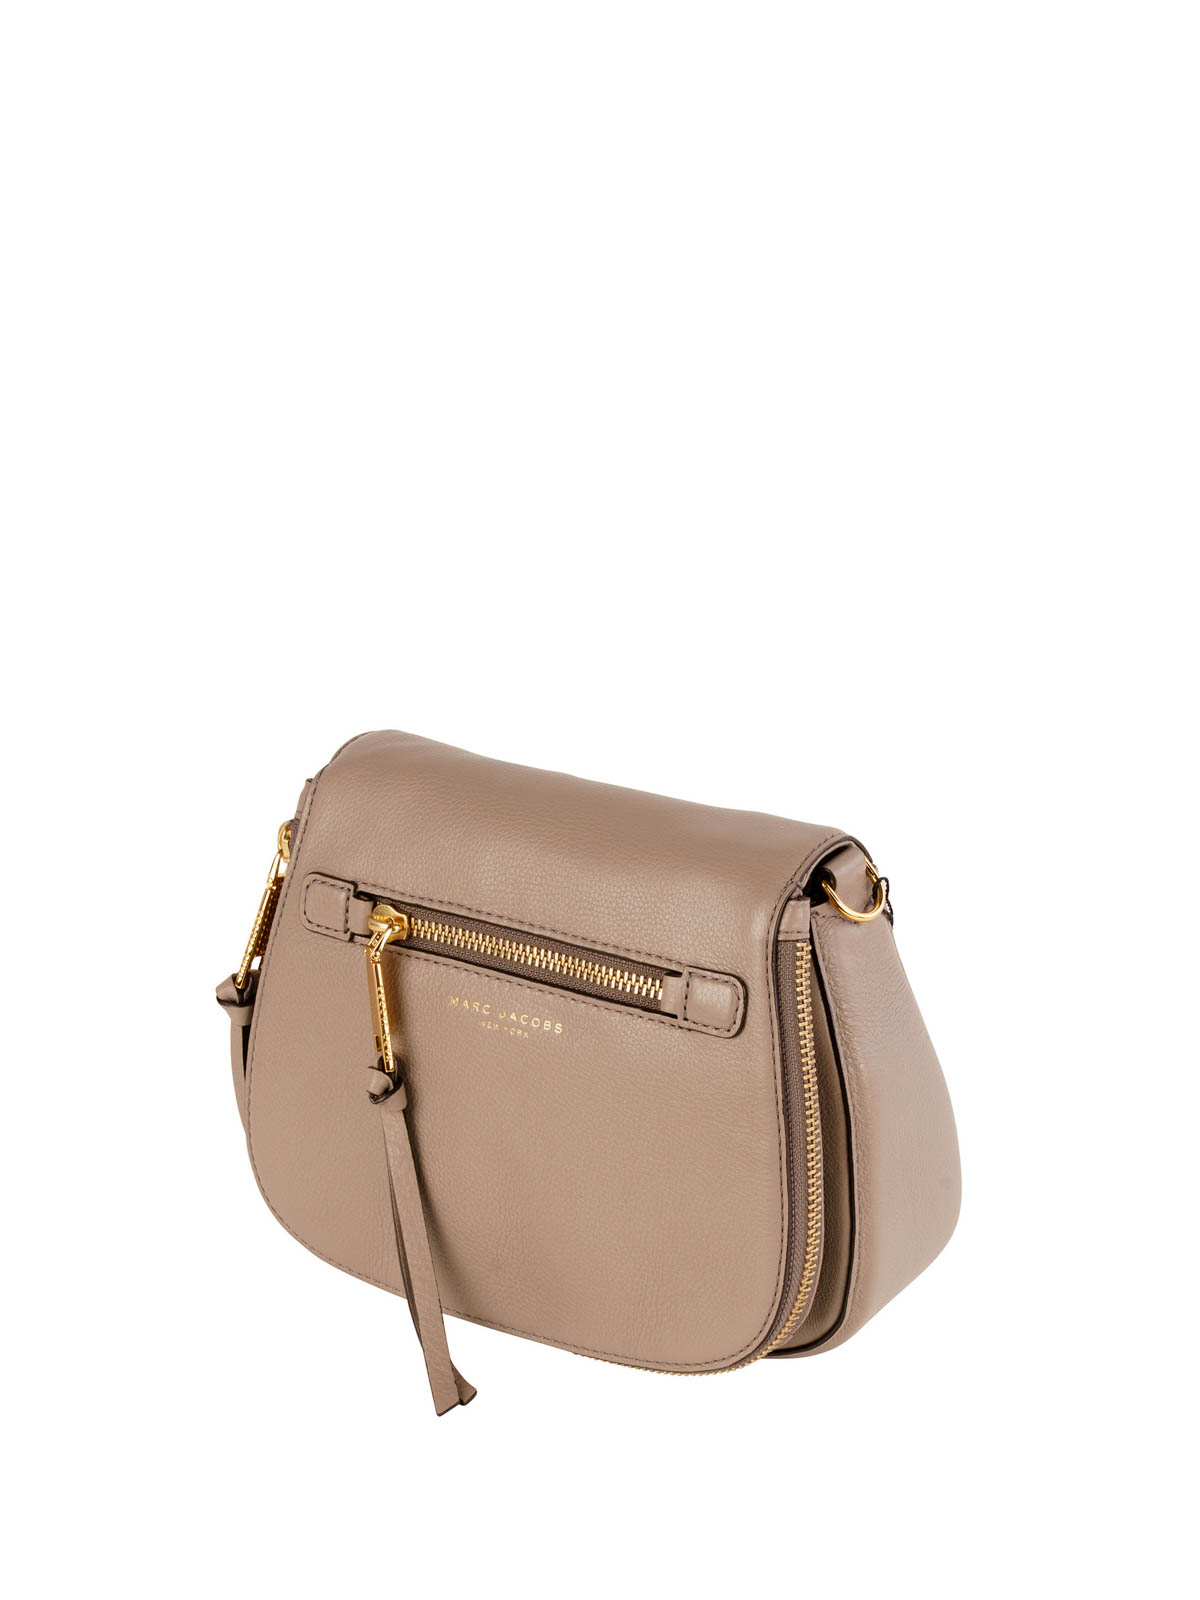 976e99a421 MARC JACOBS  cross body bags online - Recruit leather cross body bag